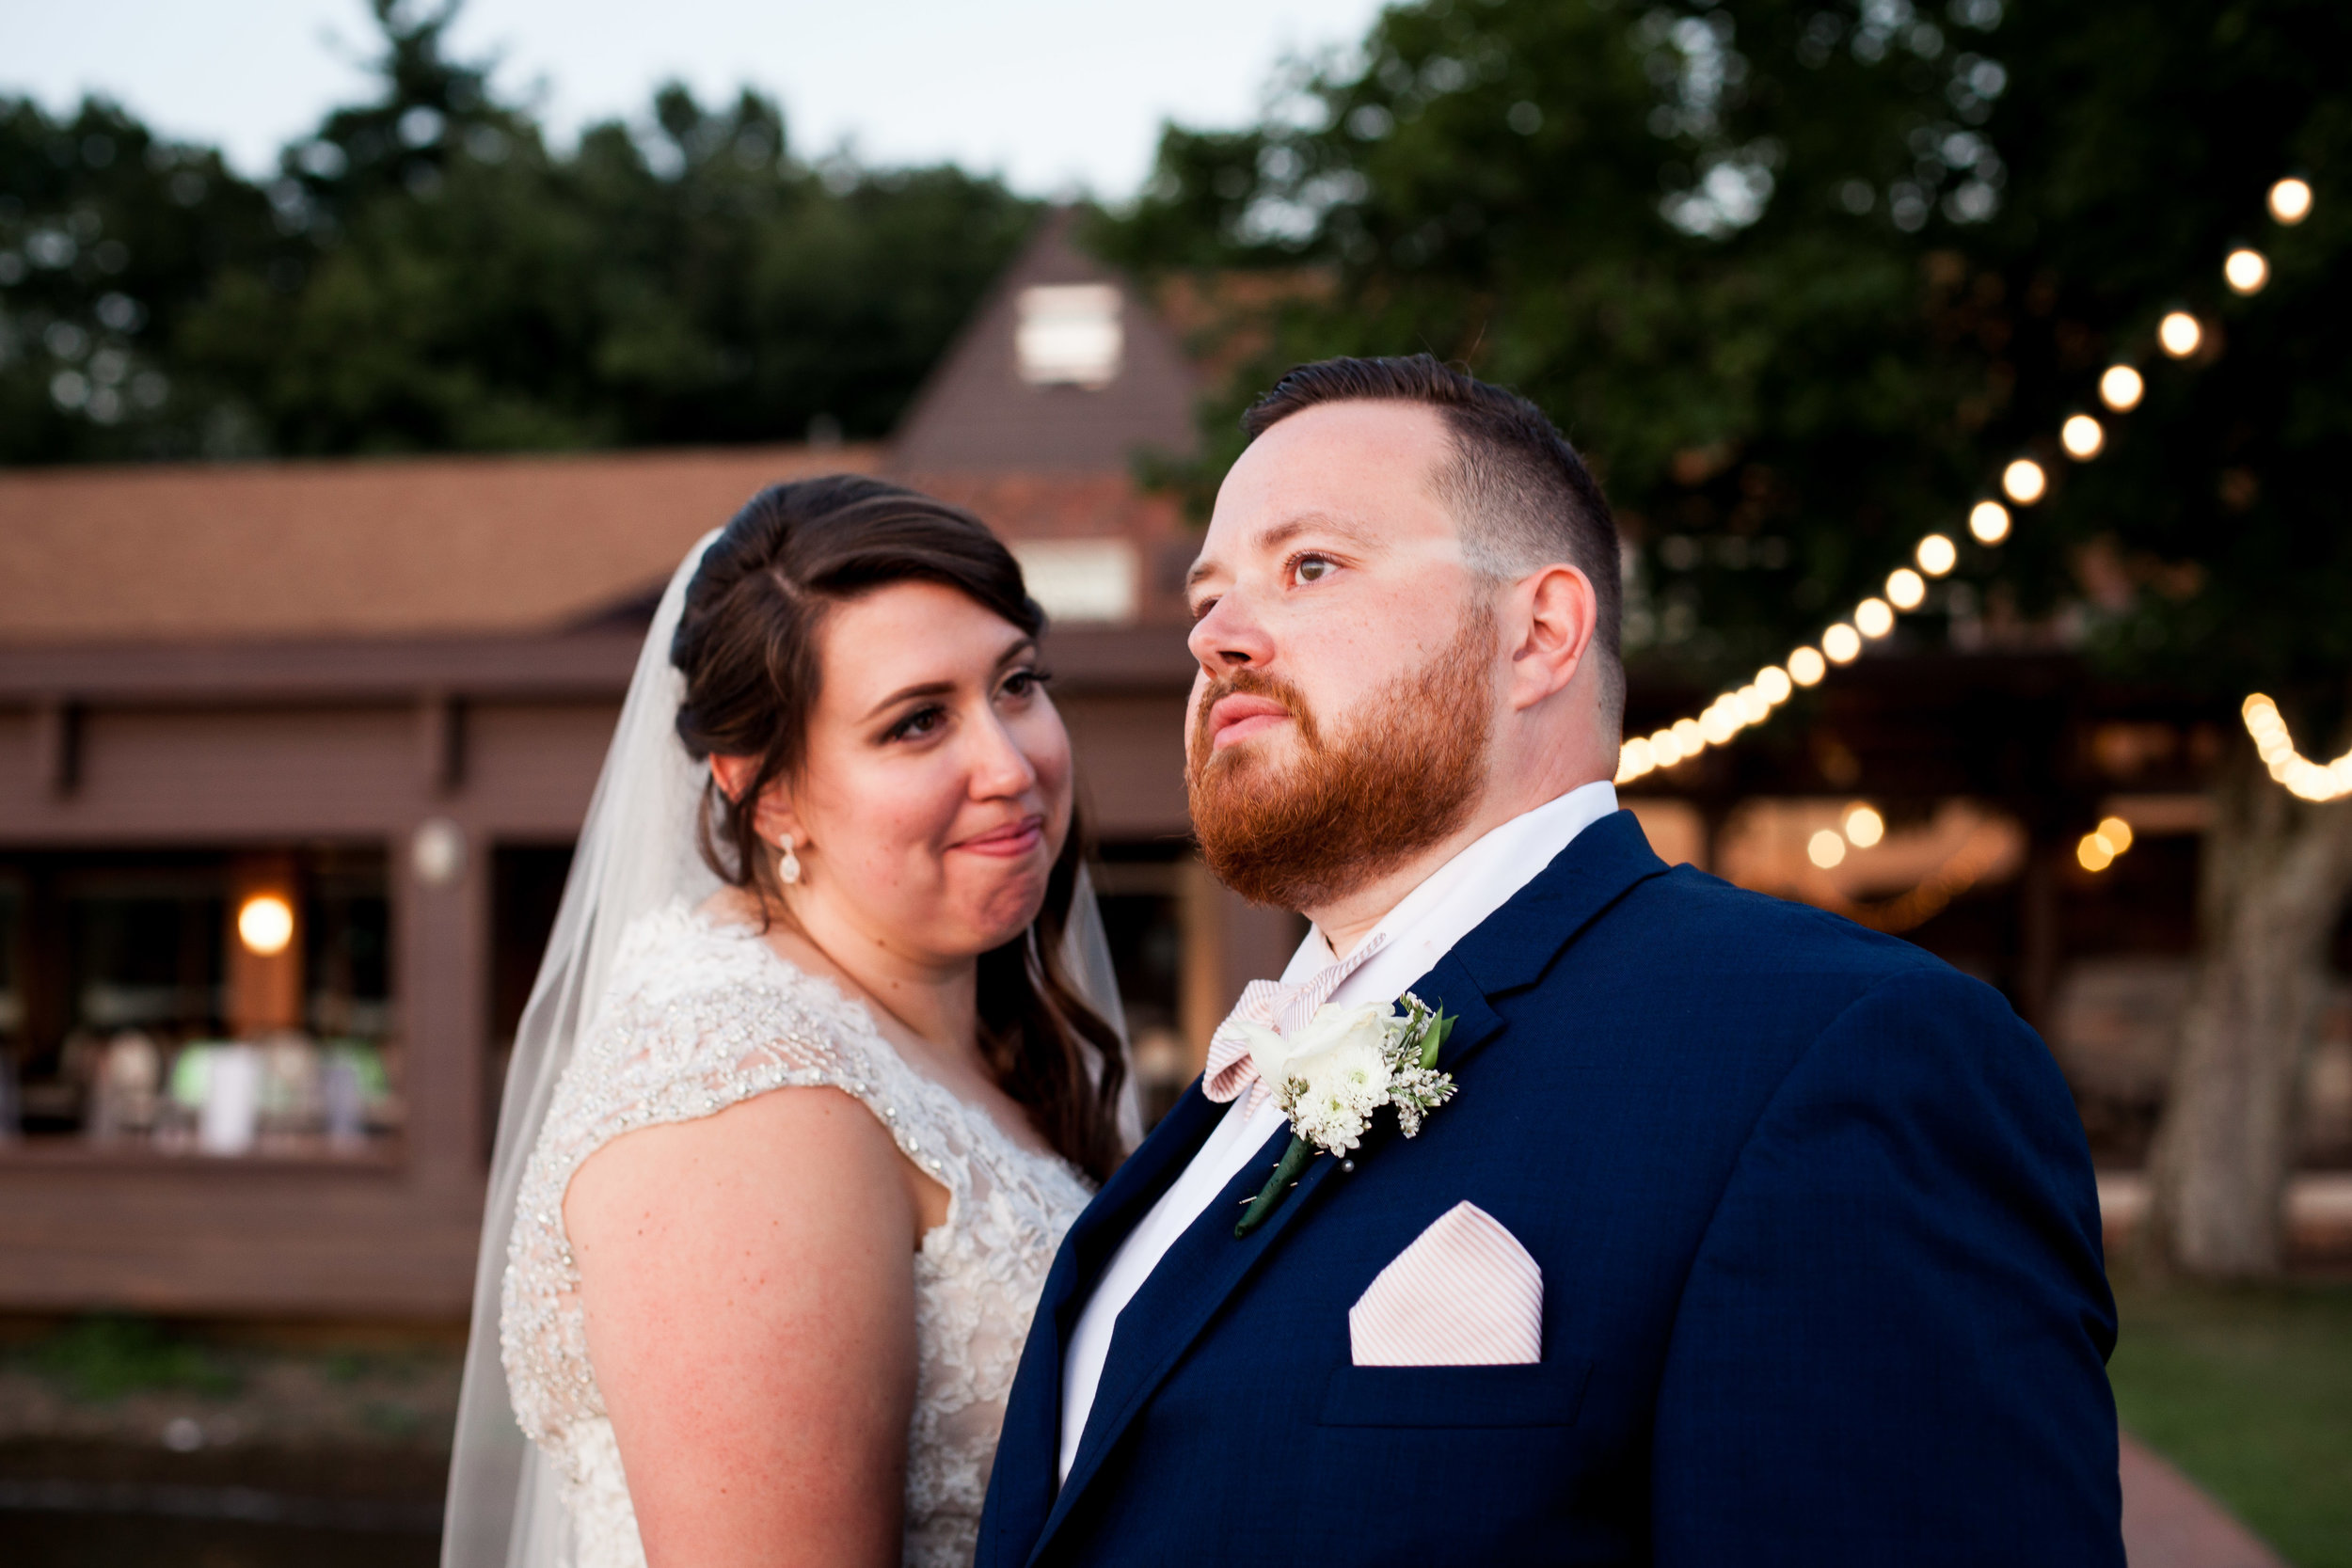 pittsburgh_wedding_photographer_liz_capuano-1710.jpg